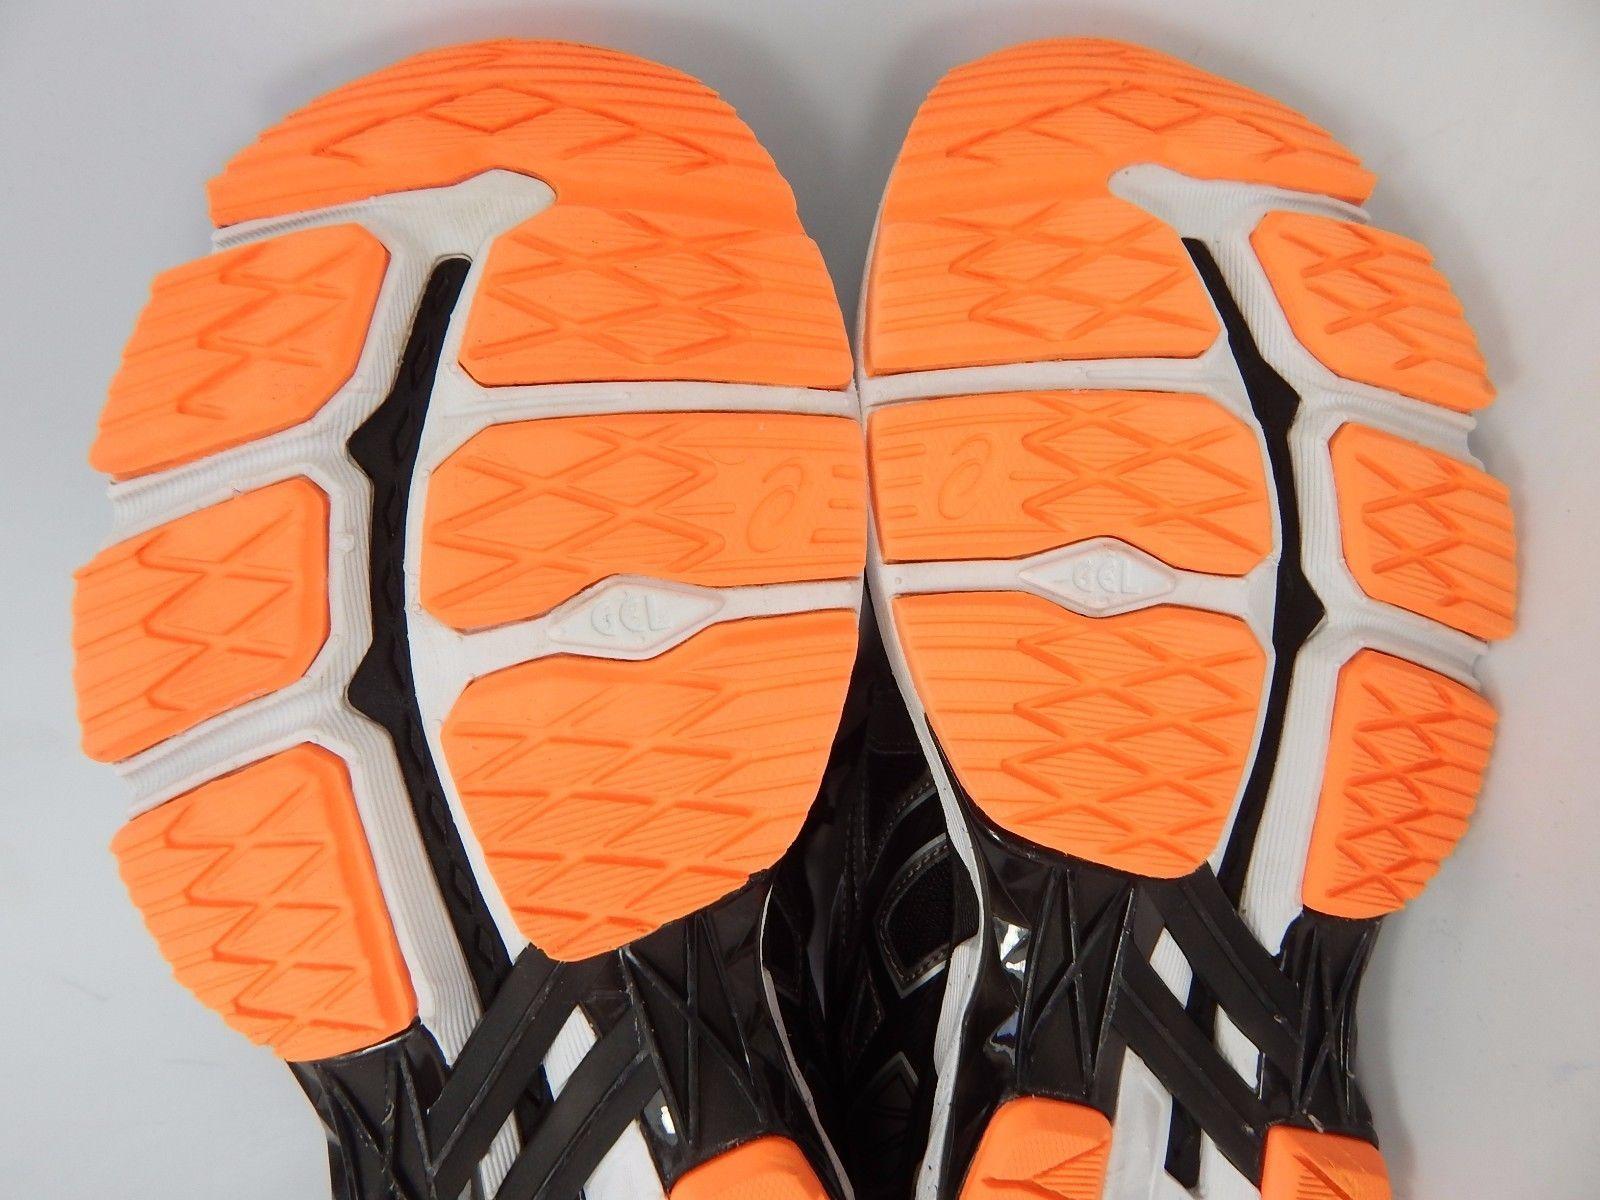 Asics GT 2000 V4 Men's Running Shoes Size US 7 M (D) EU 40 Gray T606N